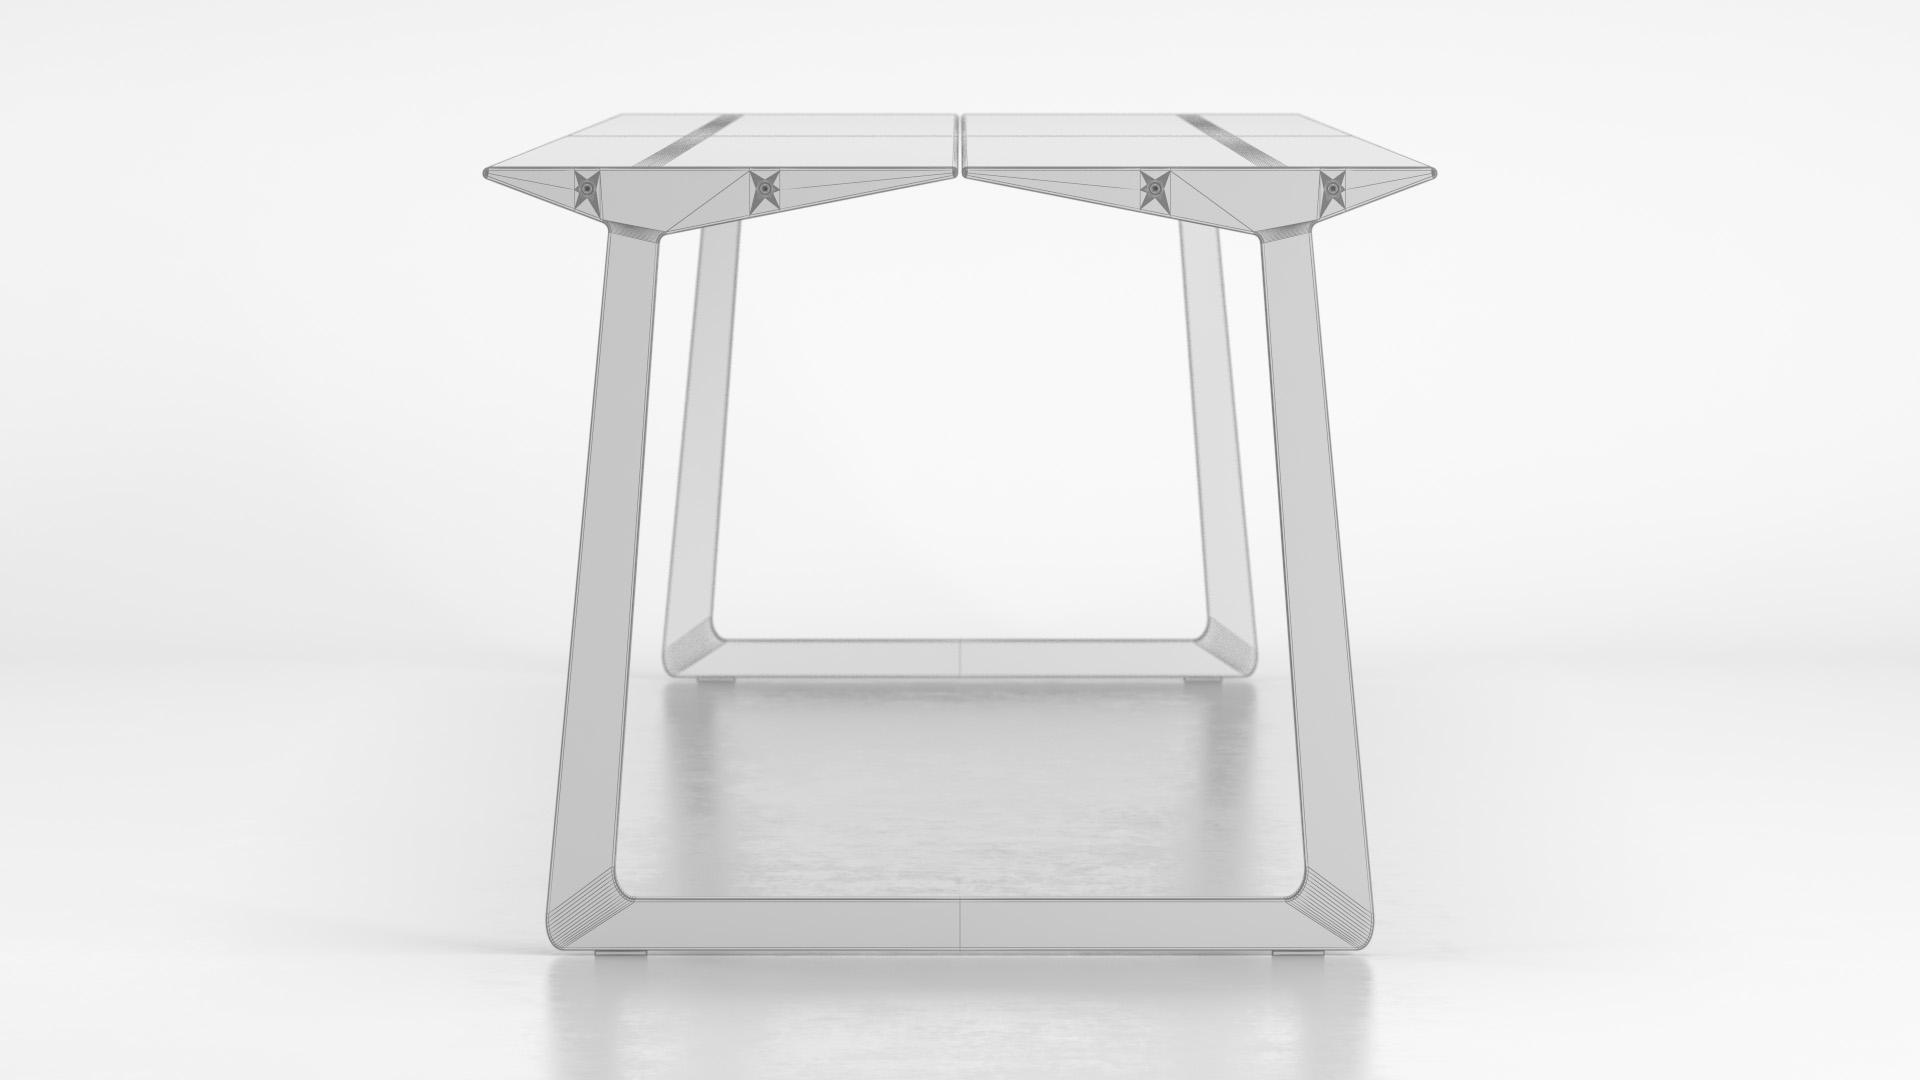 Tribu_Bird_Table_WhiteSet_01_wire_0002